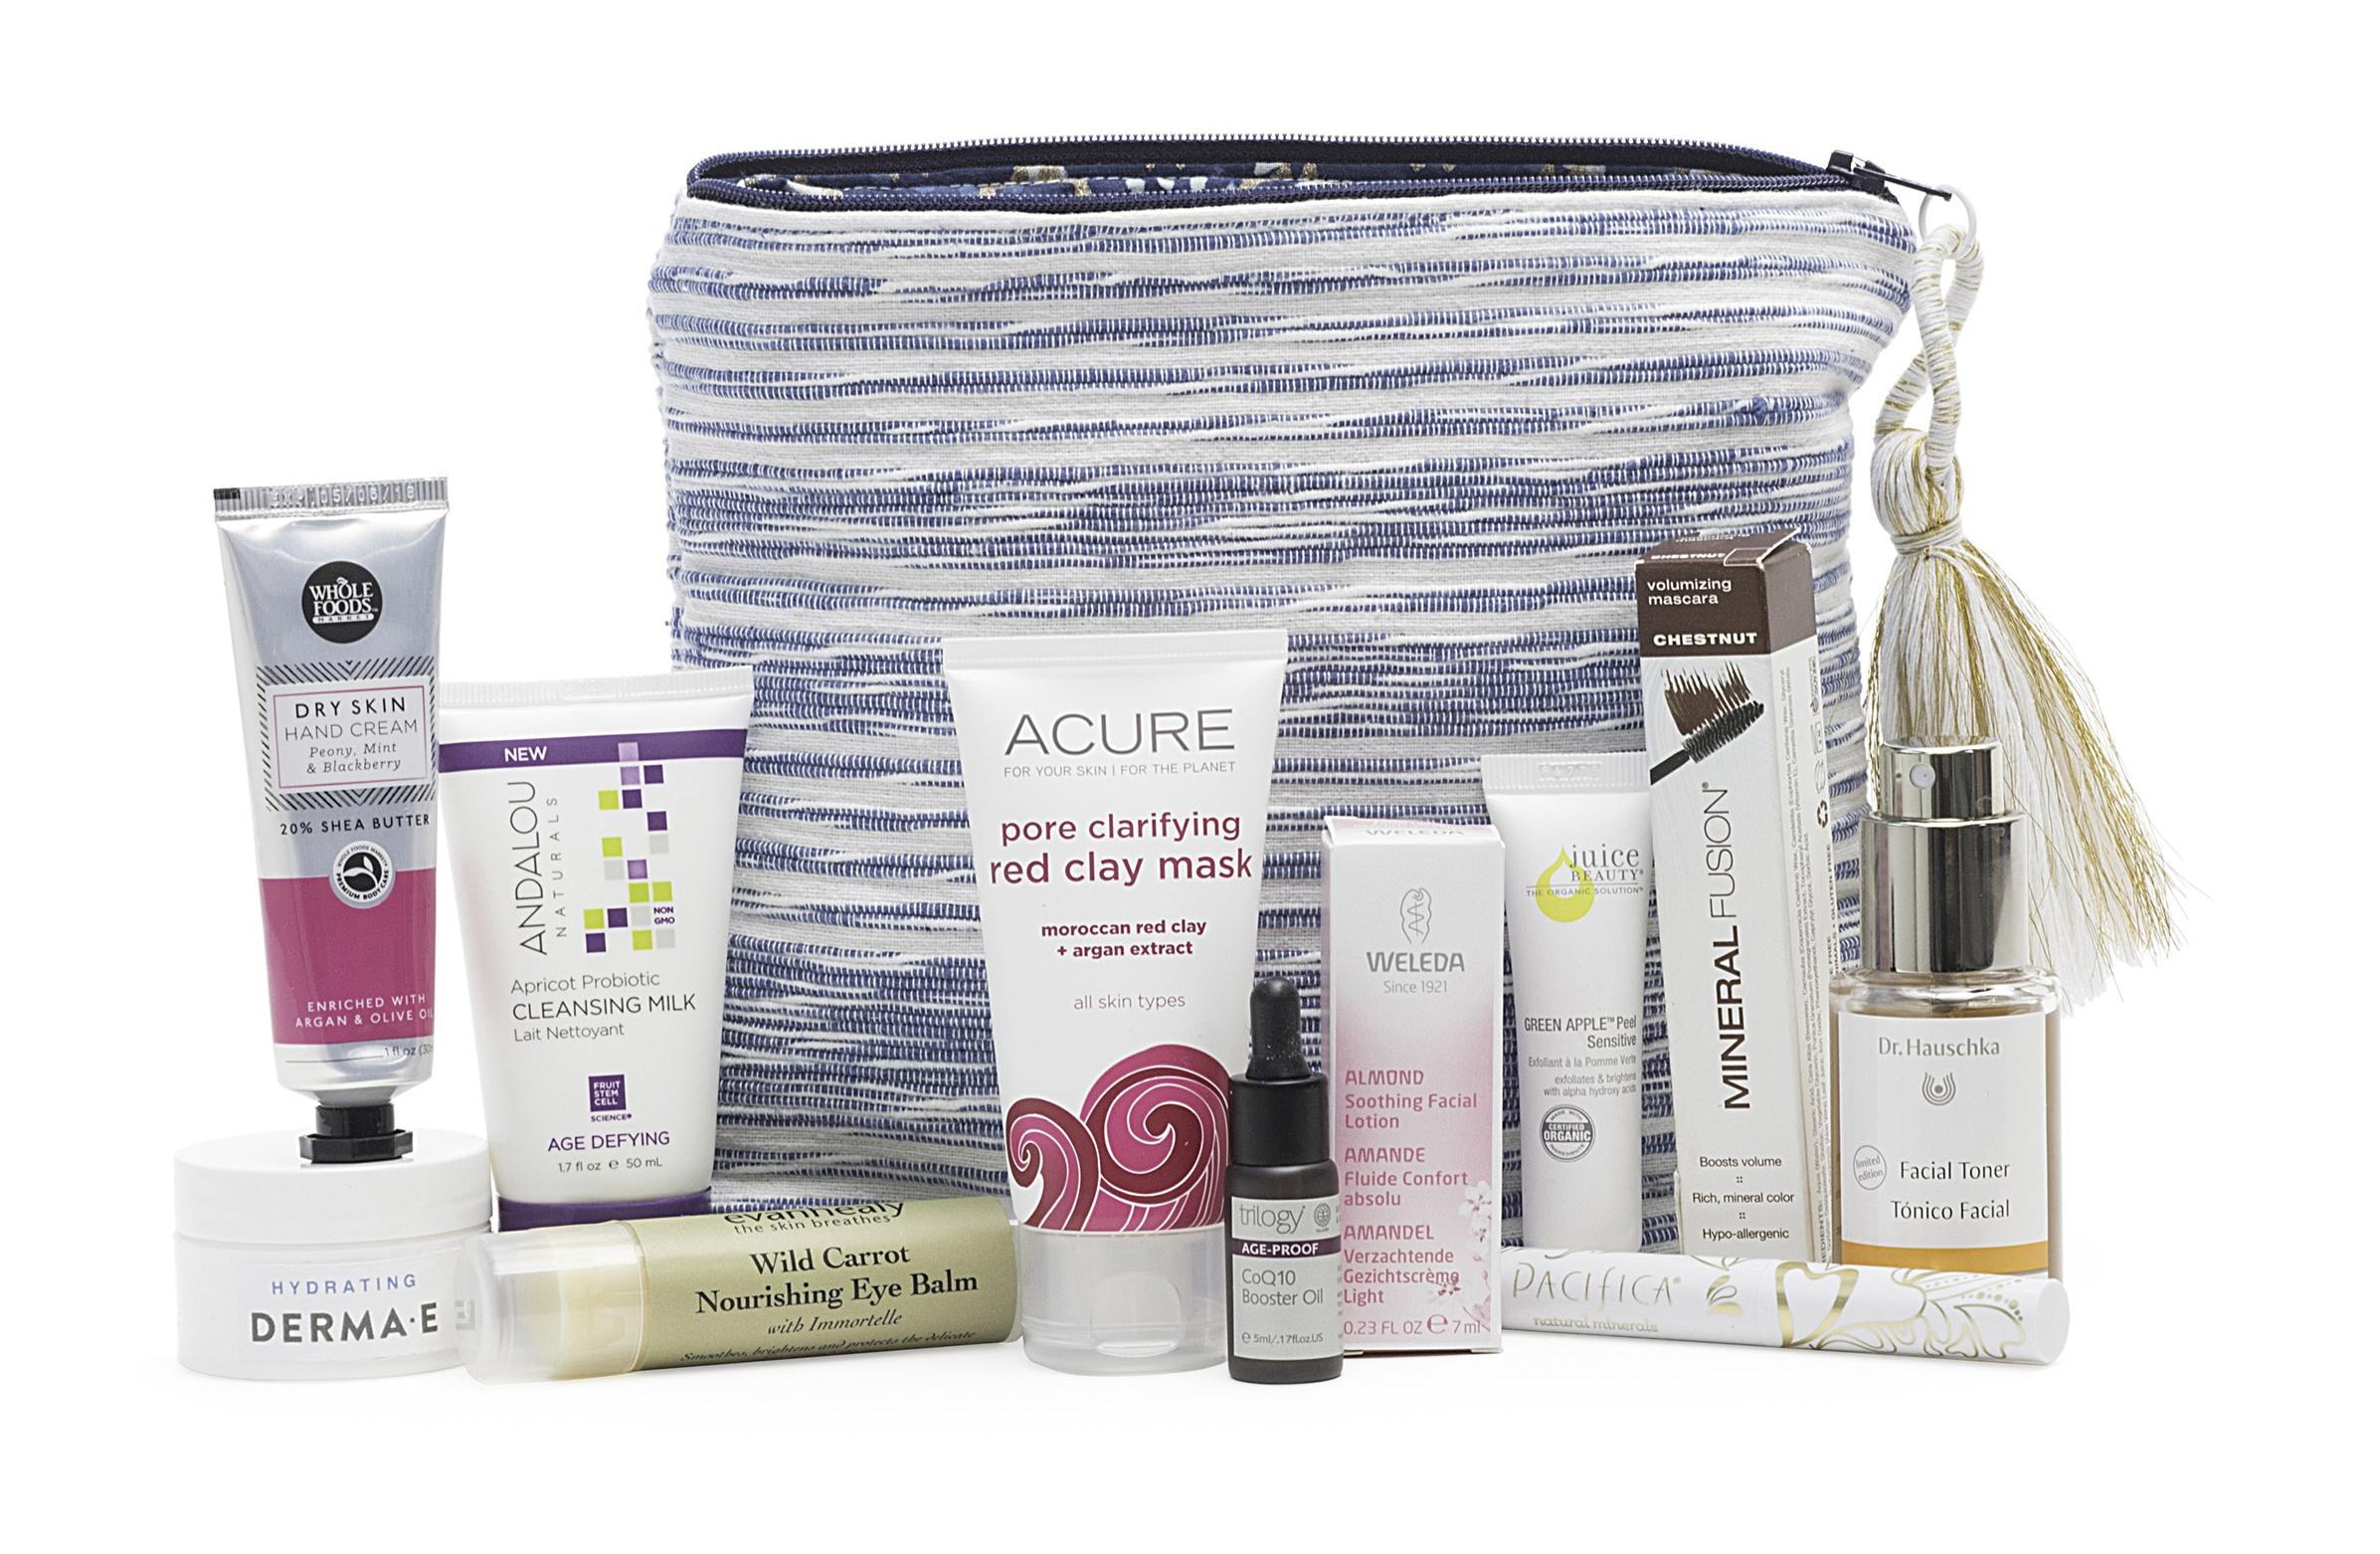 Hello Beauty Bags Whole Foods.jpg